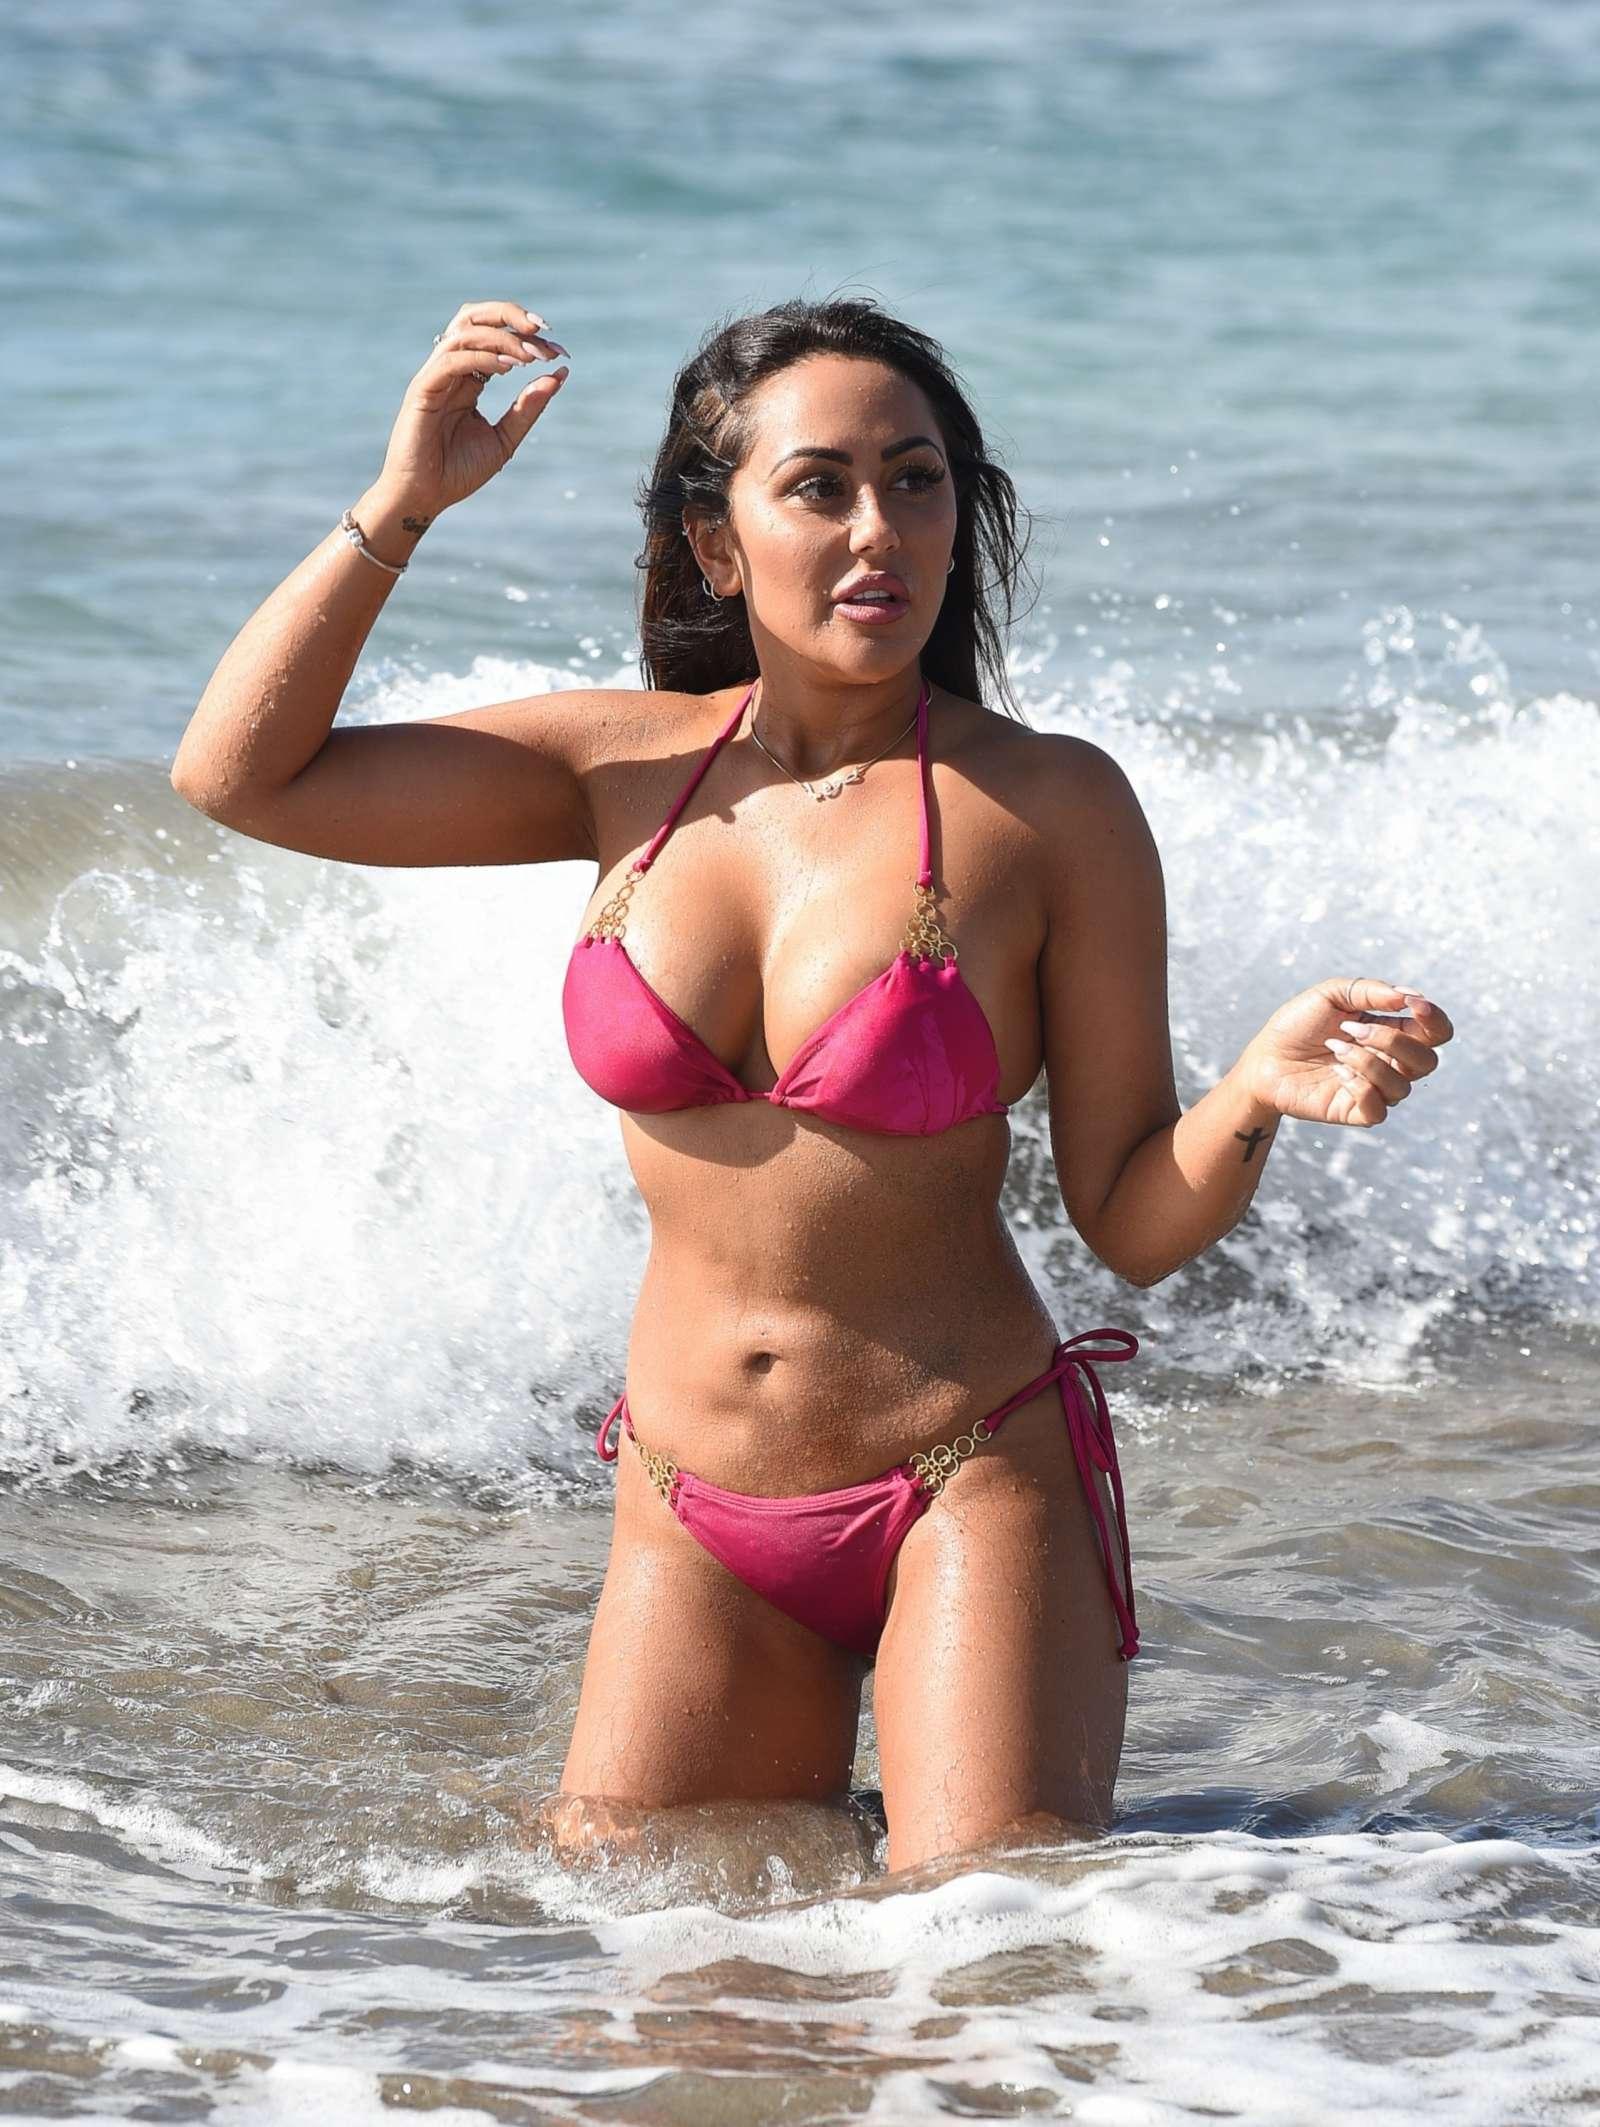 Gwen Stefani in Bikini Top in Playa del Carmen Pic 14 of 35